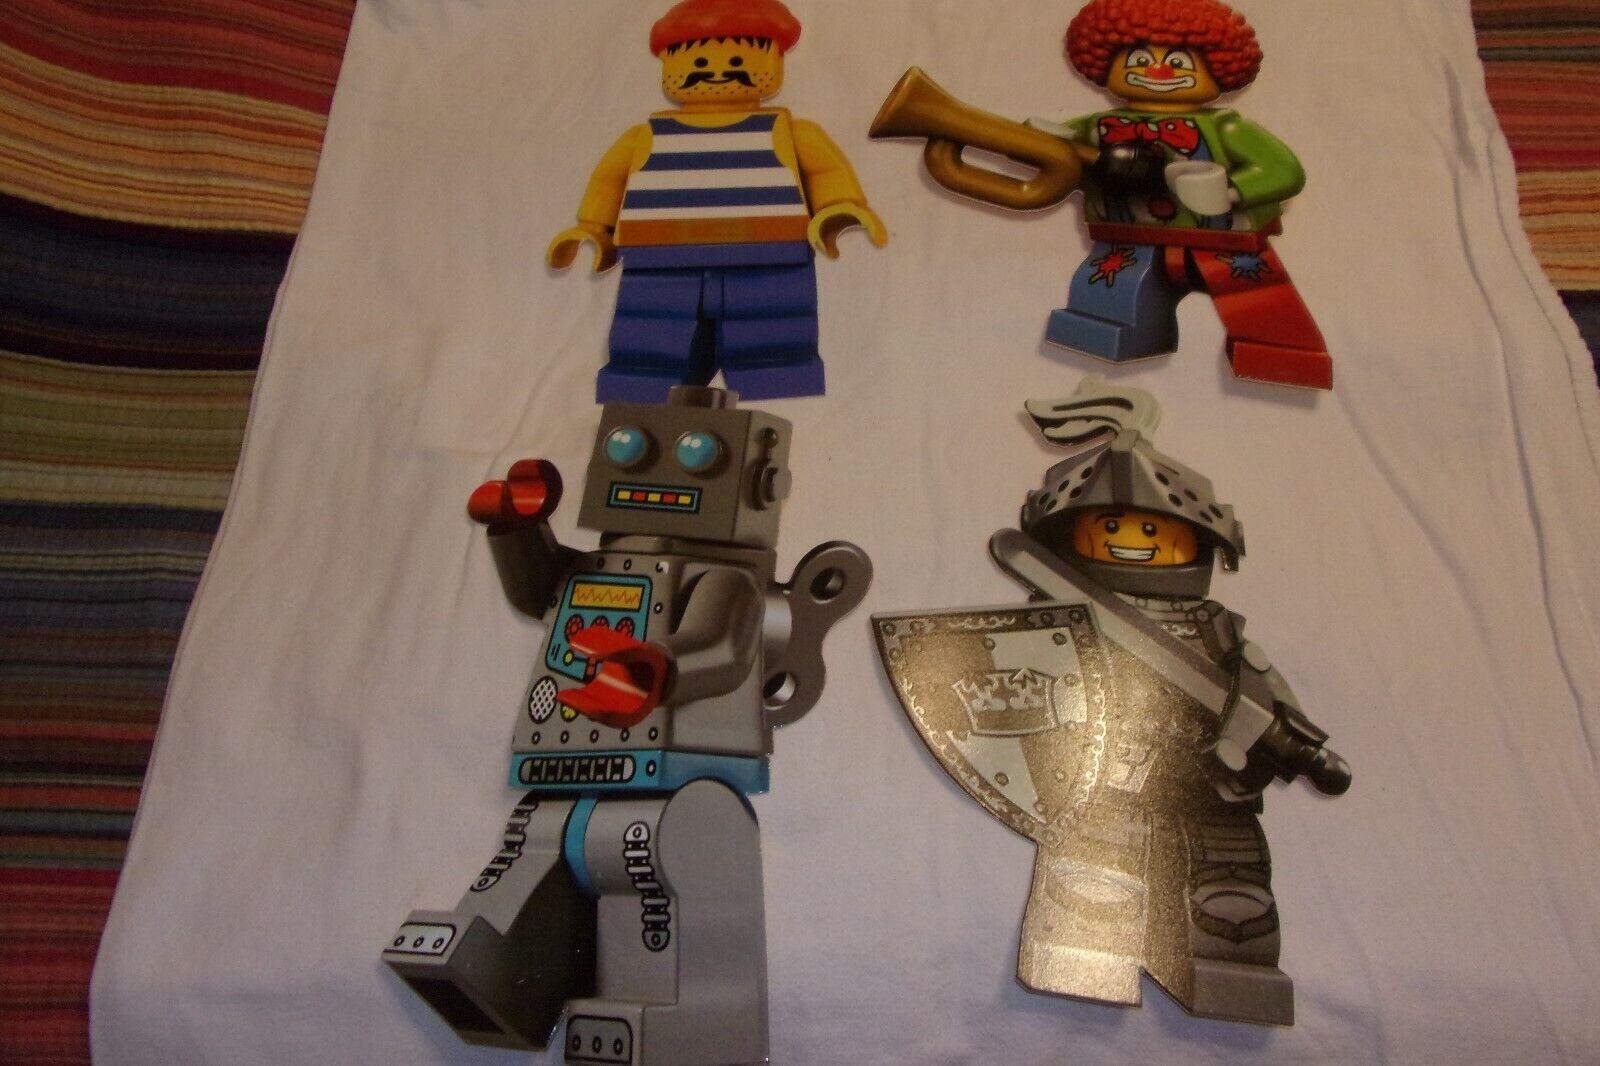 15  Lego Juguetes R Us signo de exhibición de la tienda juego de Cocheacteres Payaso robot Caballero Pirata